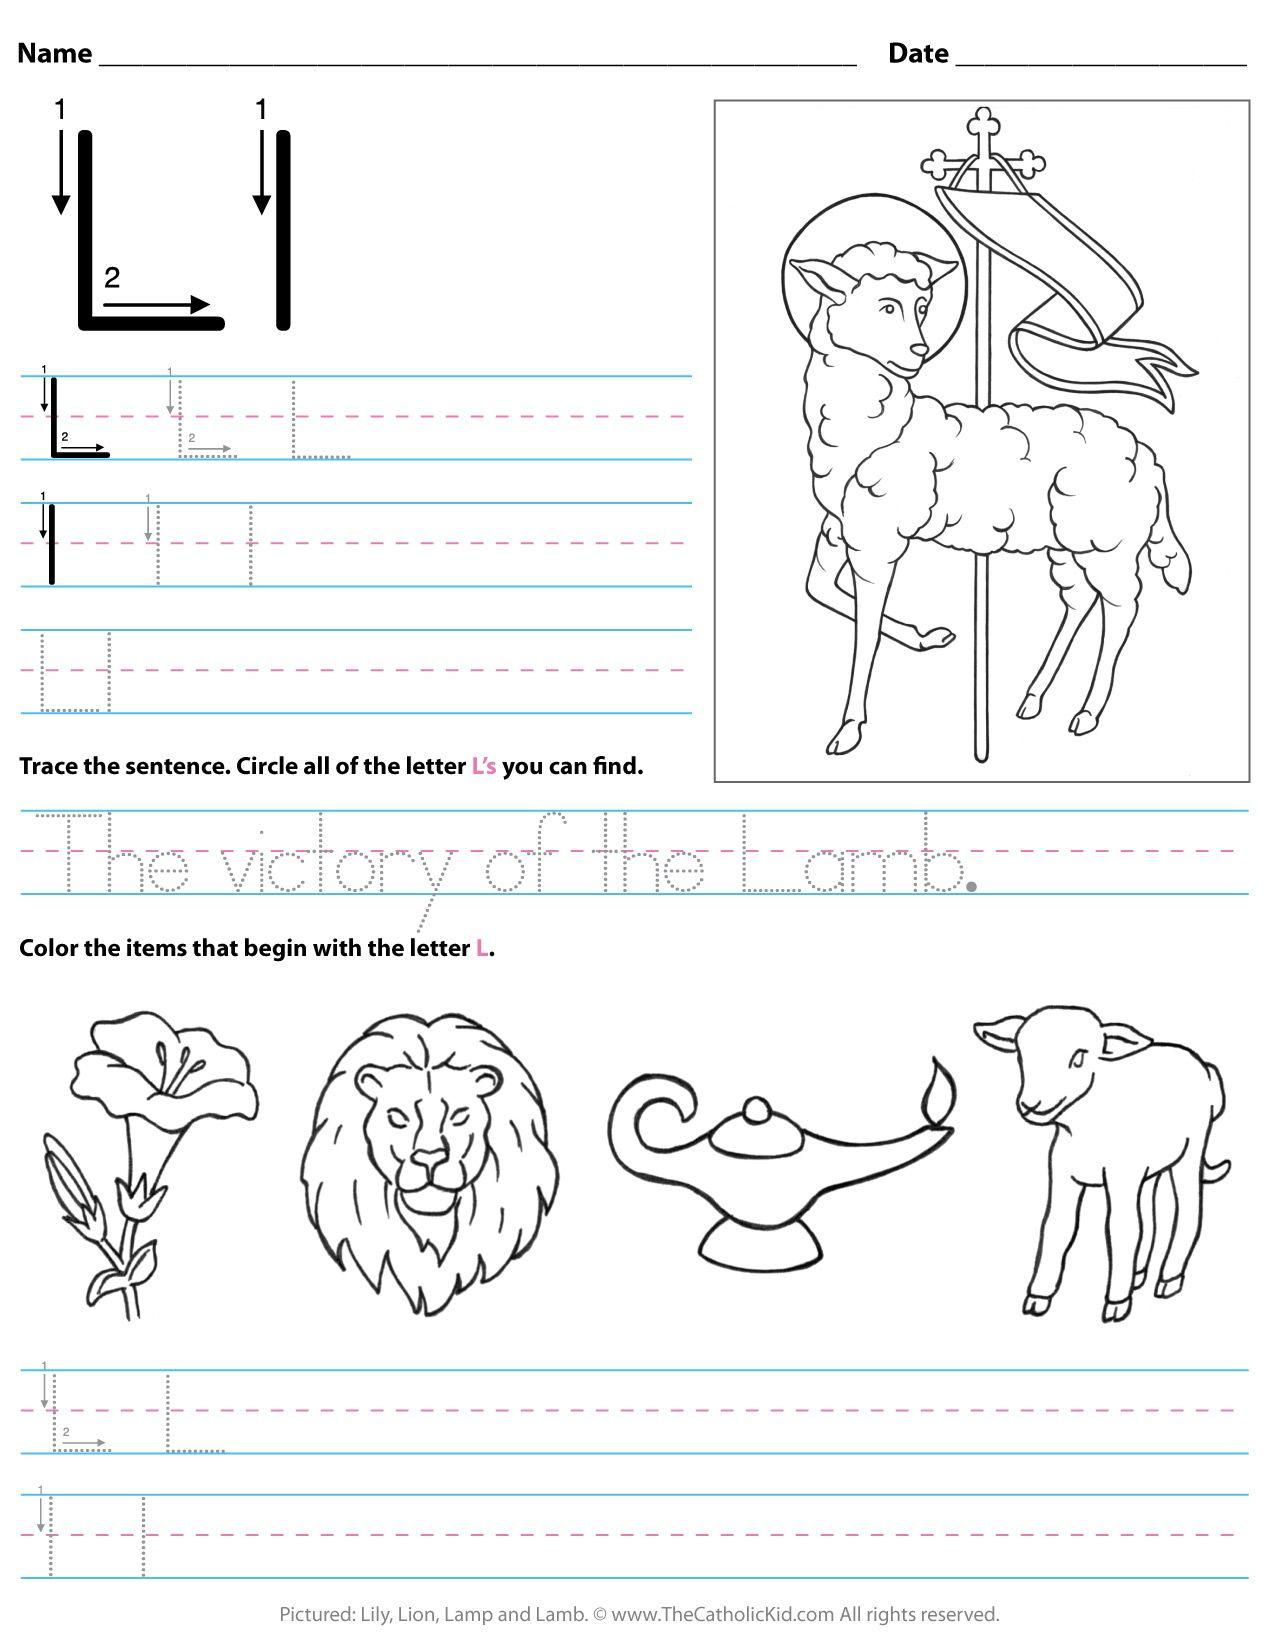 Catholic Alphabet Letter L Worksheet Preschool Kindergarten for Letter L Worksheets For Preschool